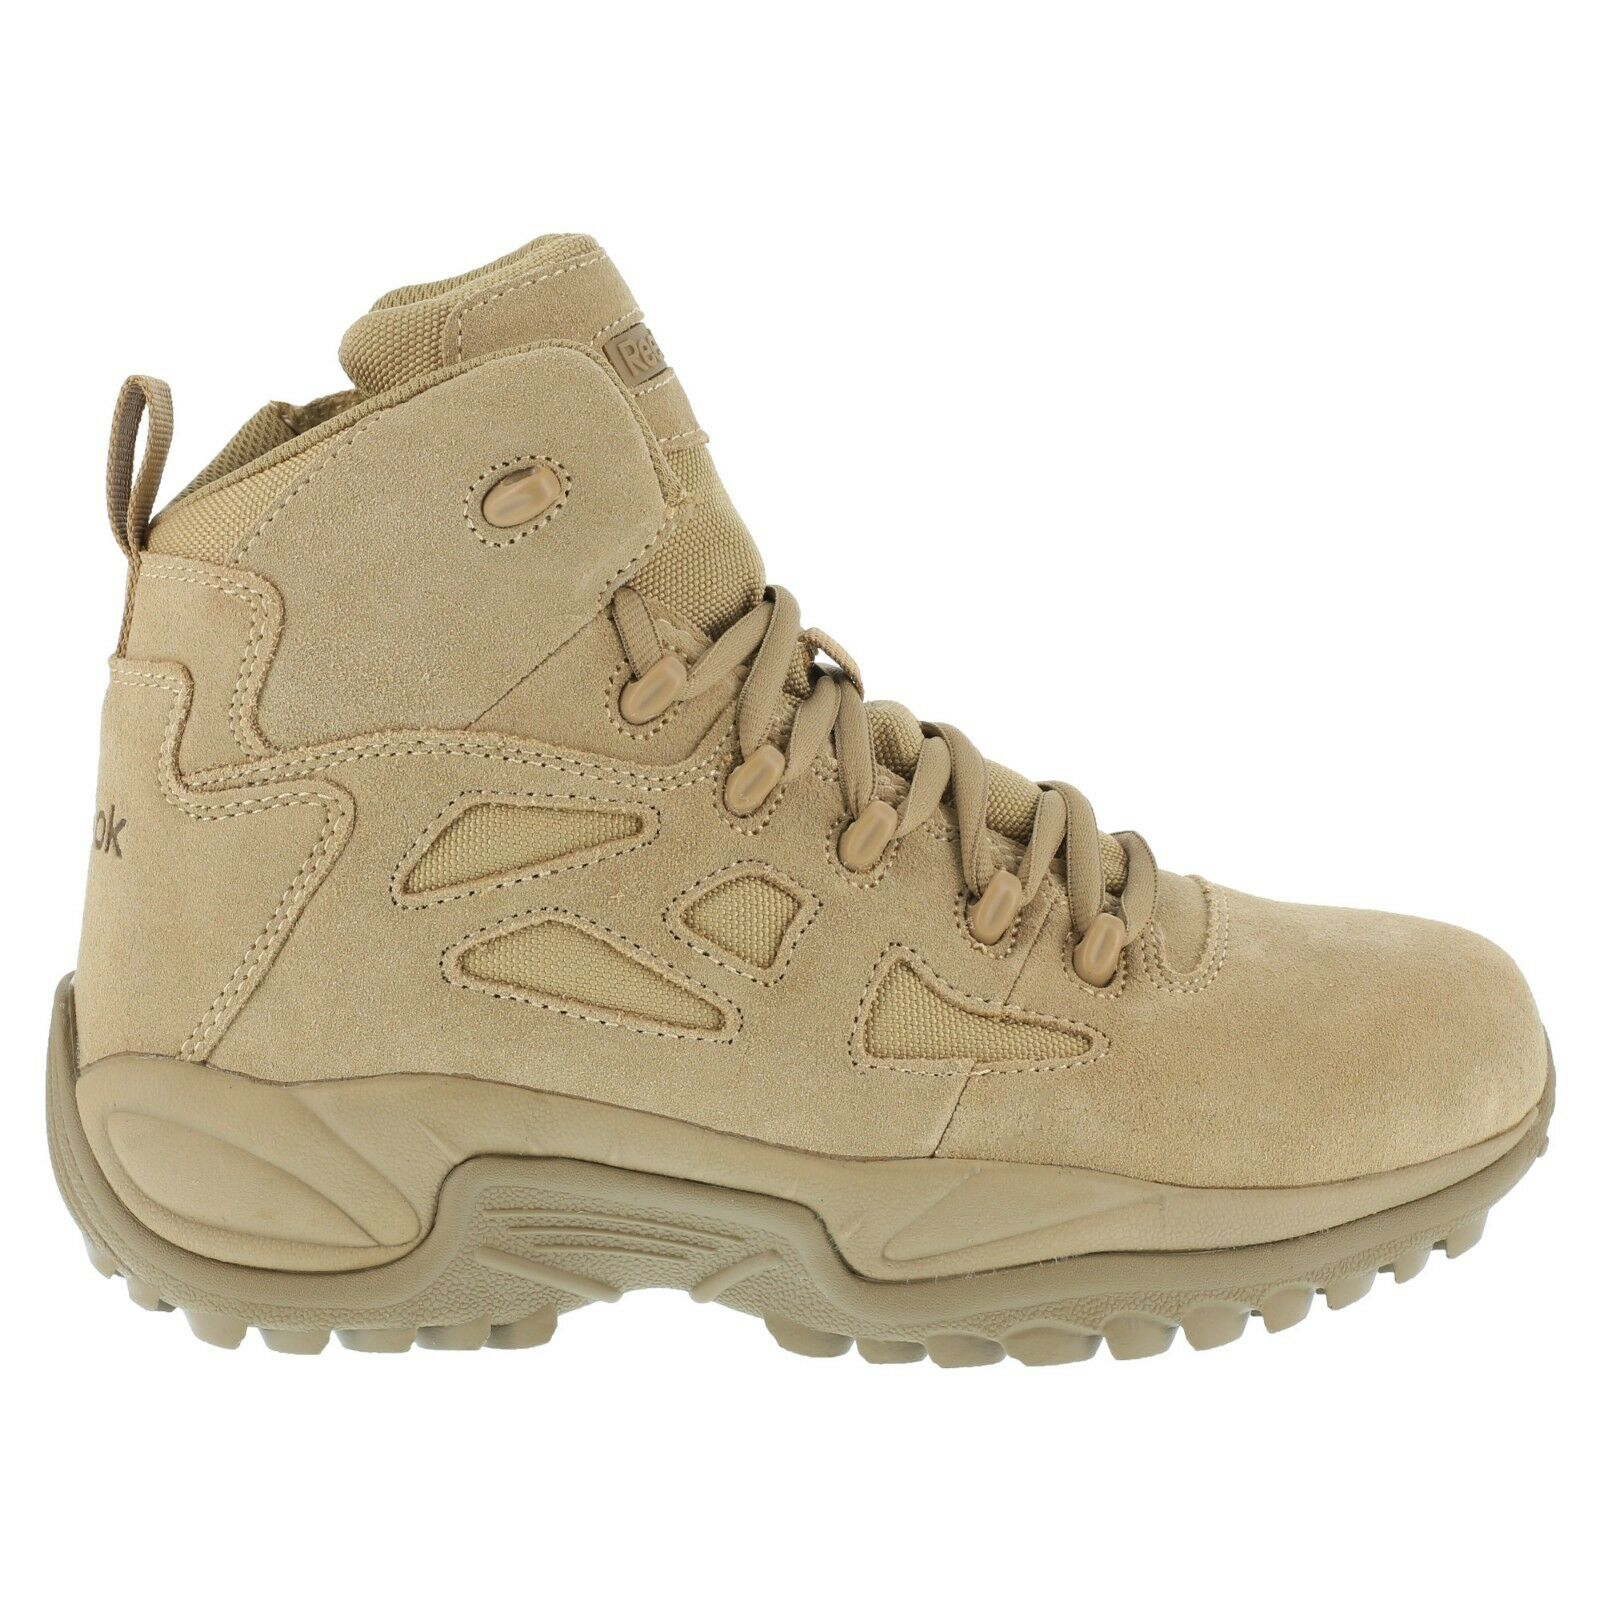 Reebok Men's Tactical Military Desert Tan Stealth Boots 6 Inch Side Zip Comp Toe